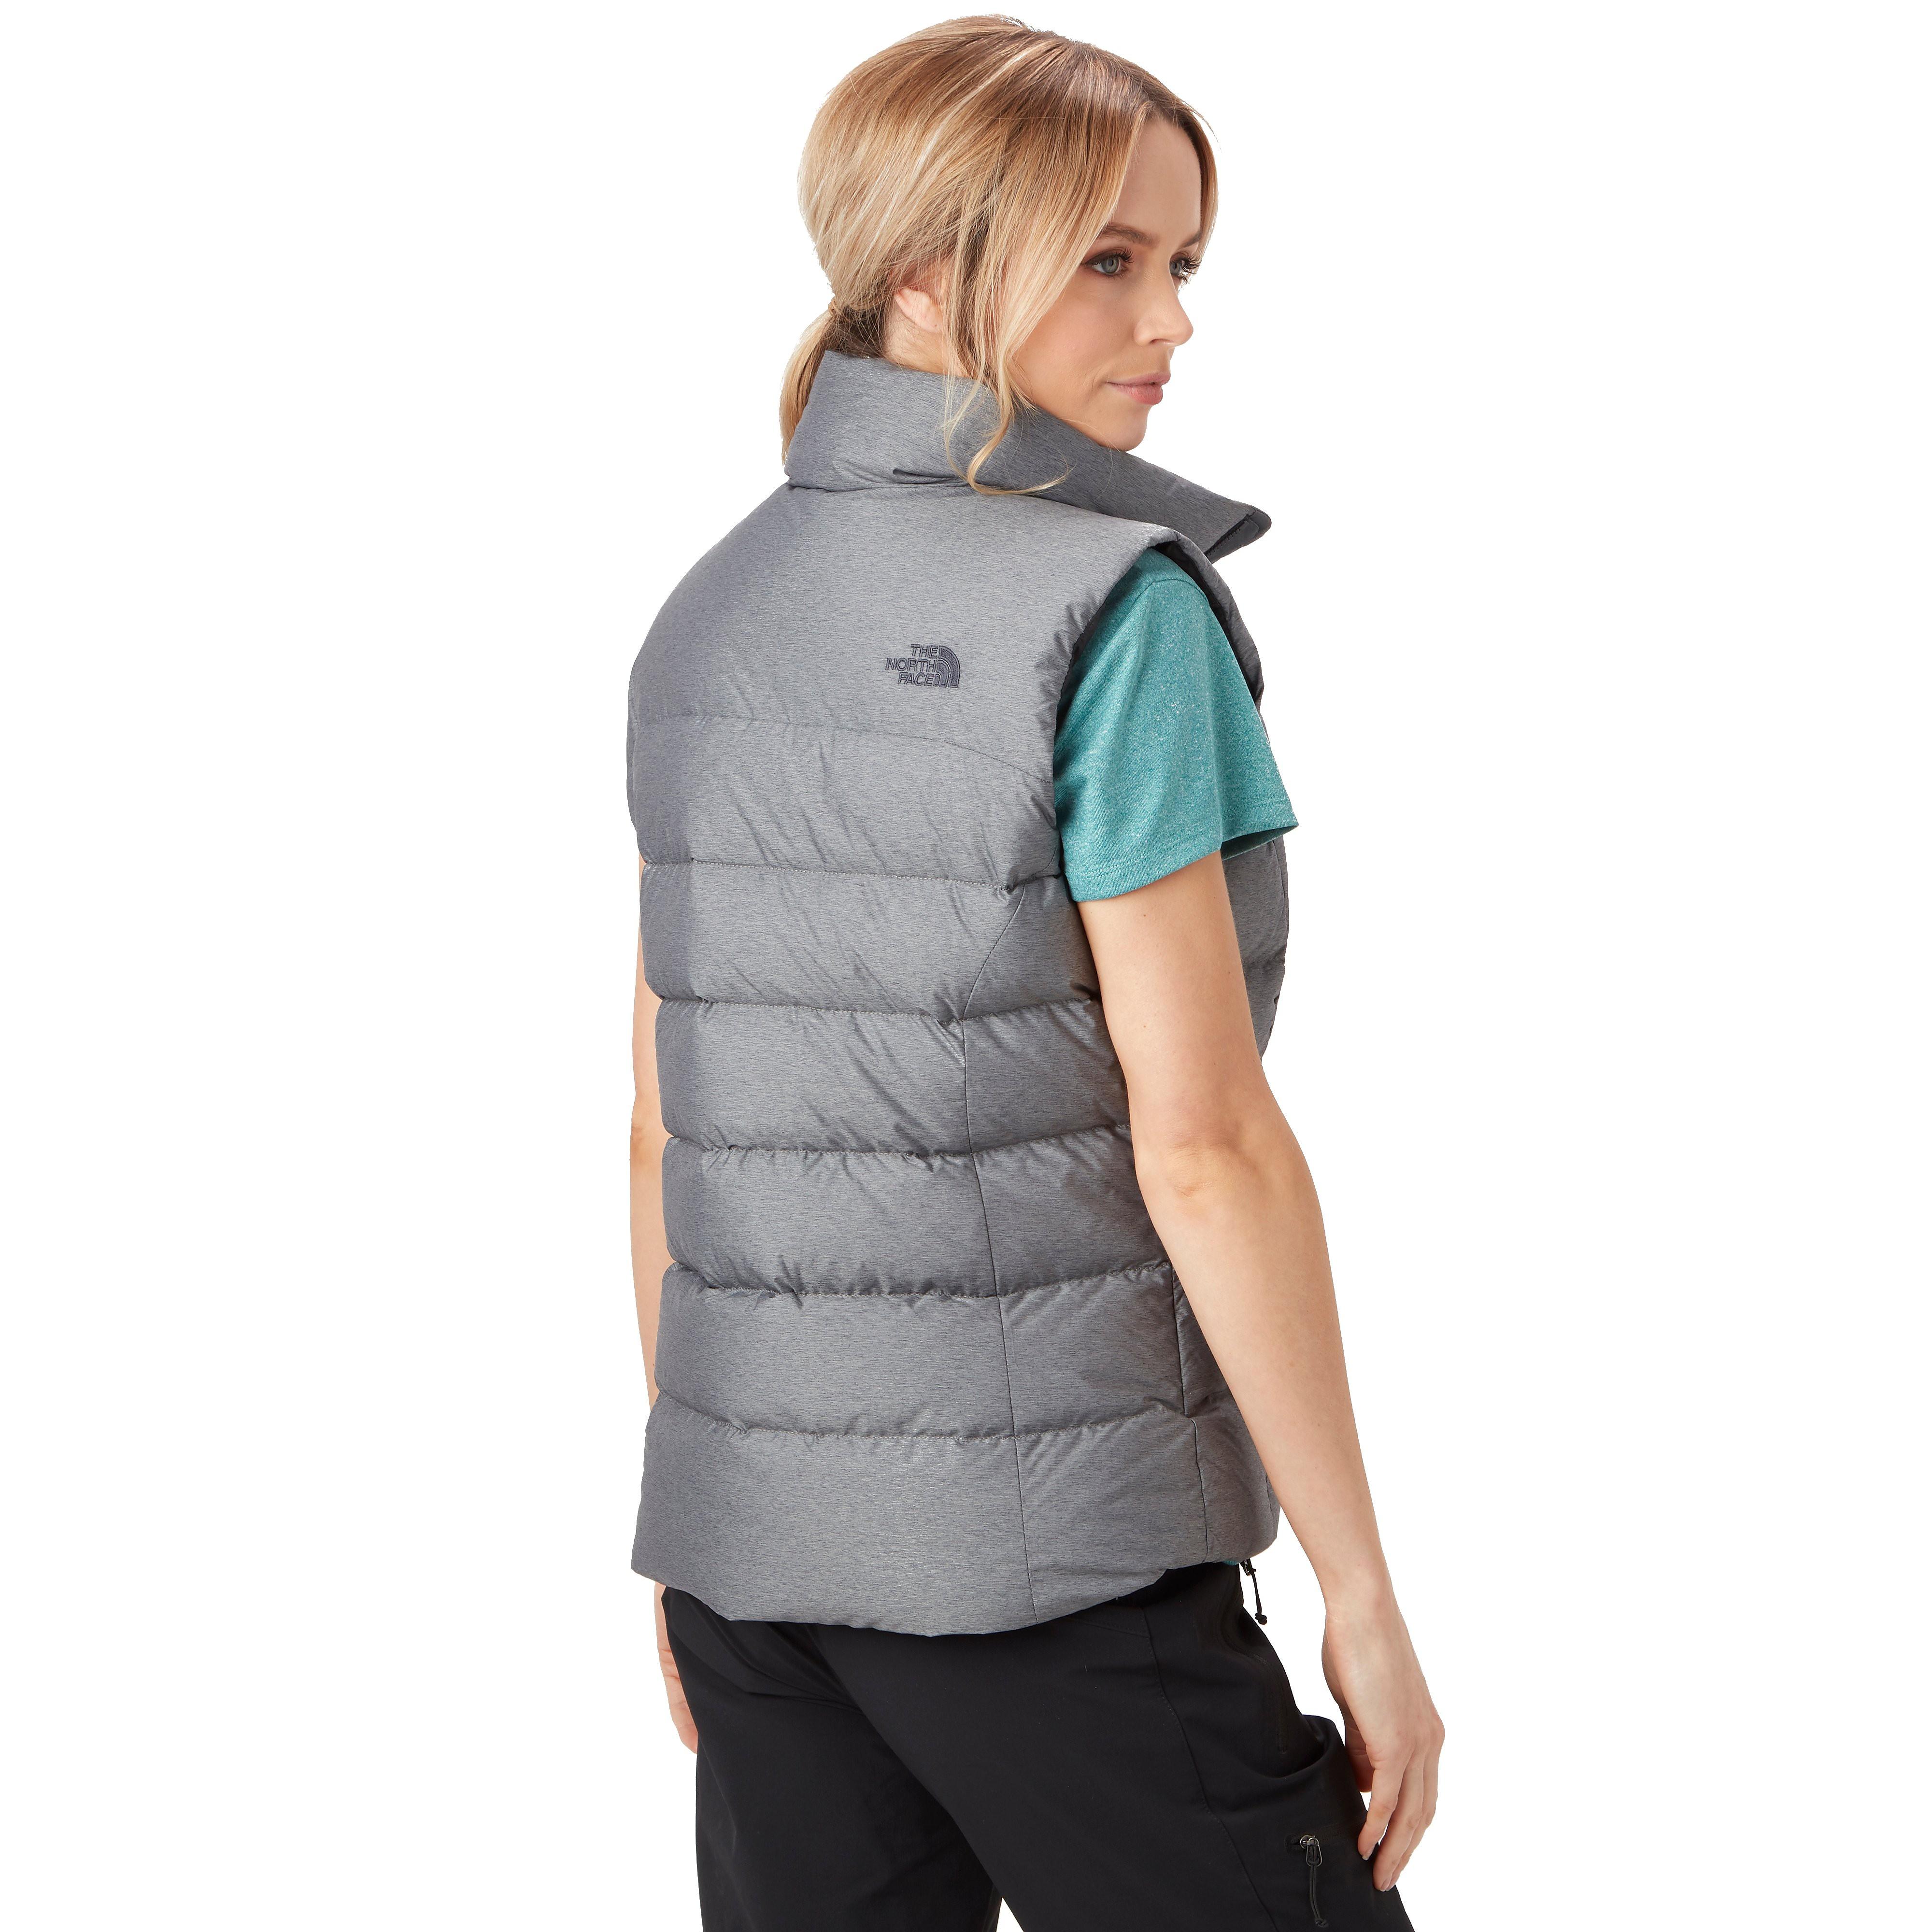 The North Face Nuptse Sleeveless Women's Jacket